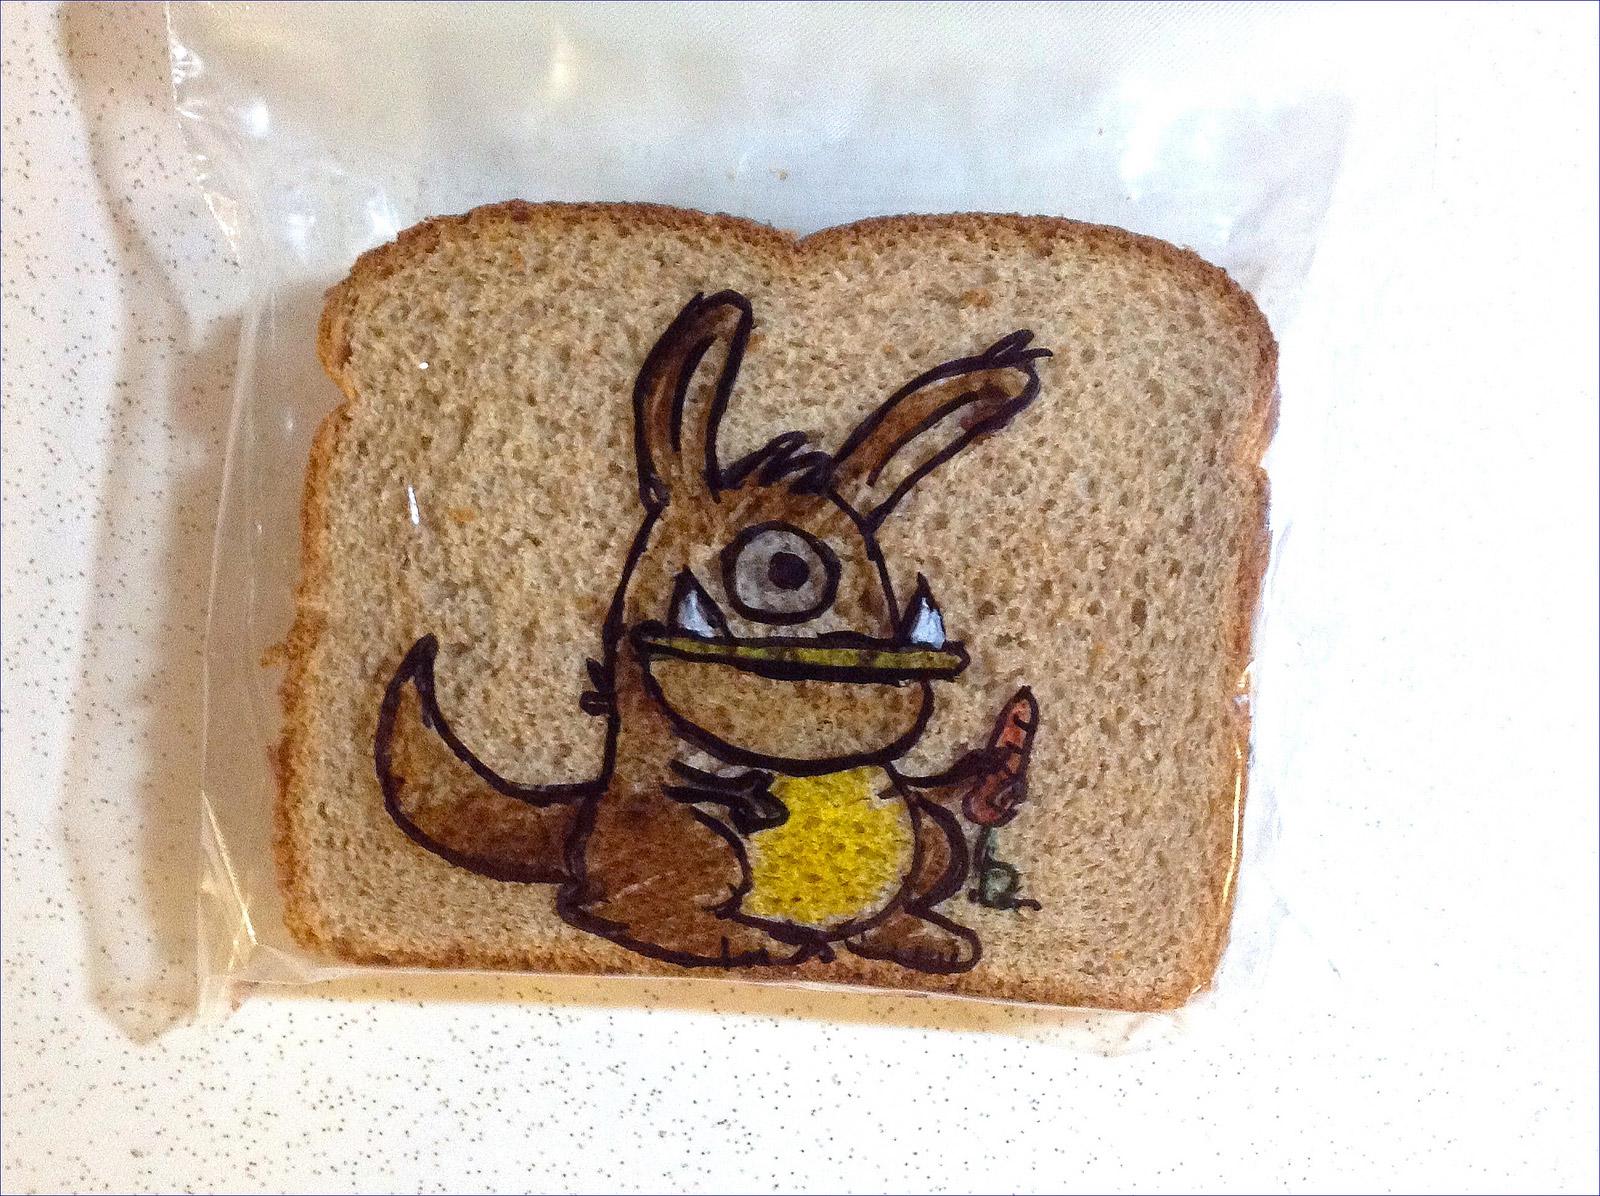 david-laferriere-creative-lunch-bag-illustration-27